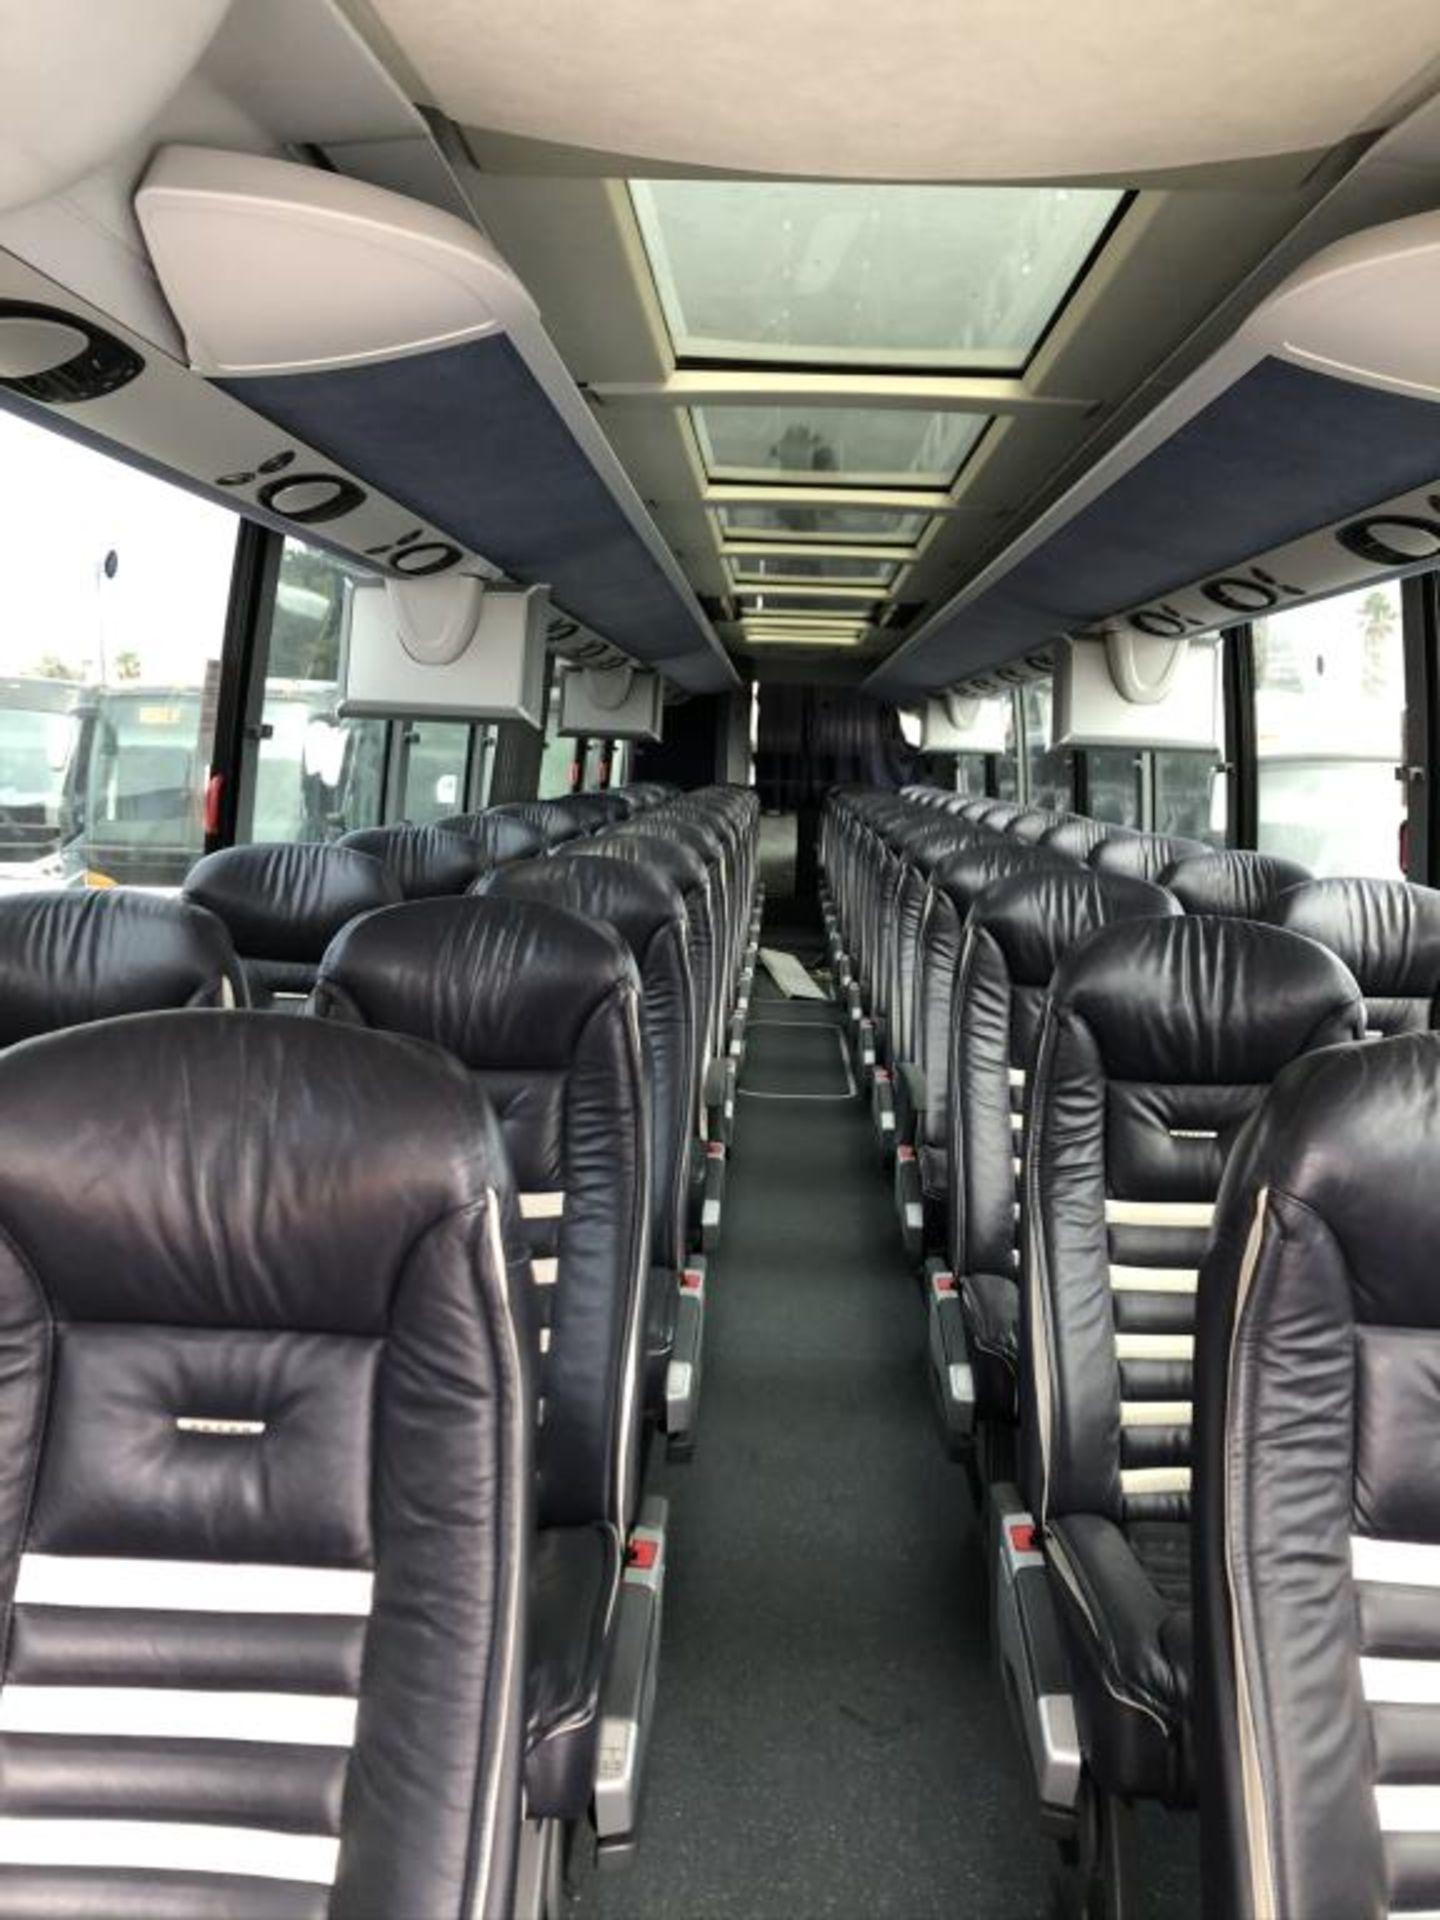 Motor Coach - Image 8 of 14